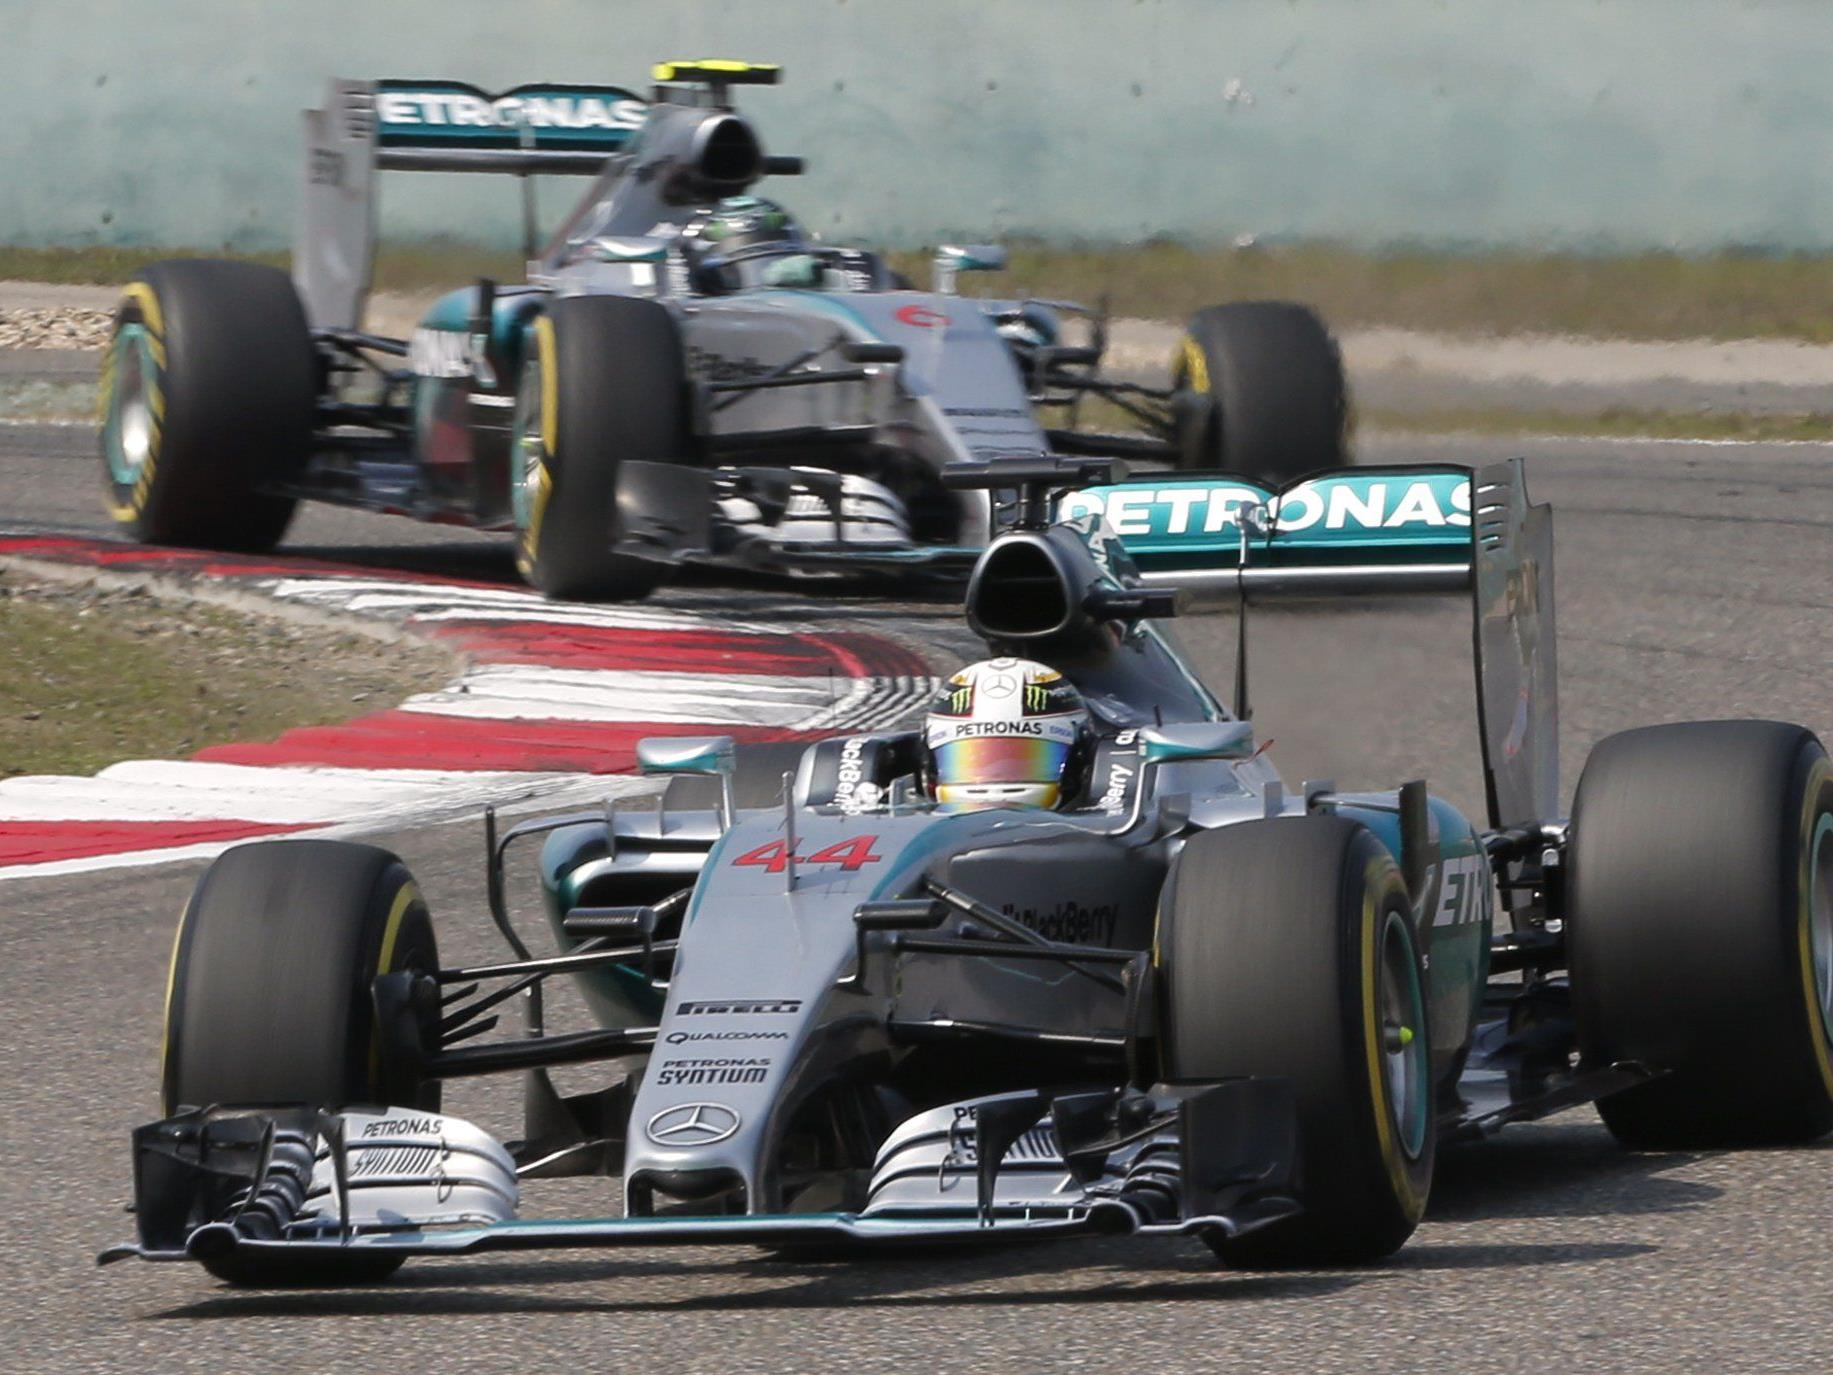 Hamilton triumphierte in China vor Rosberg und Vettel.